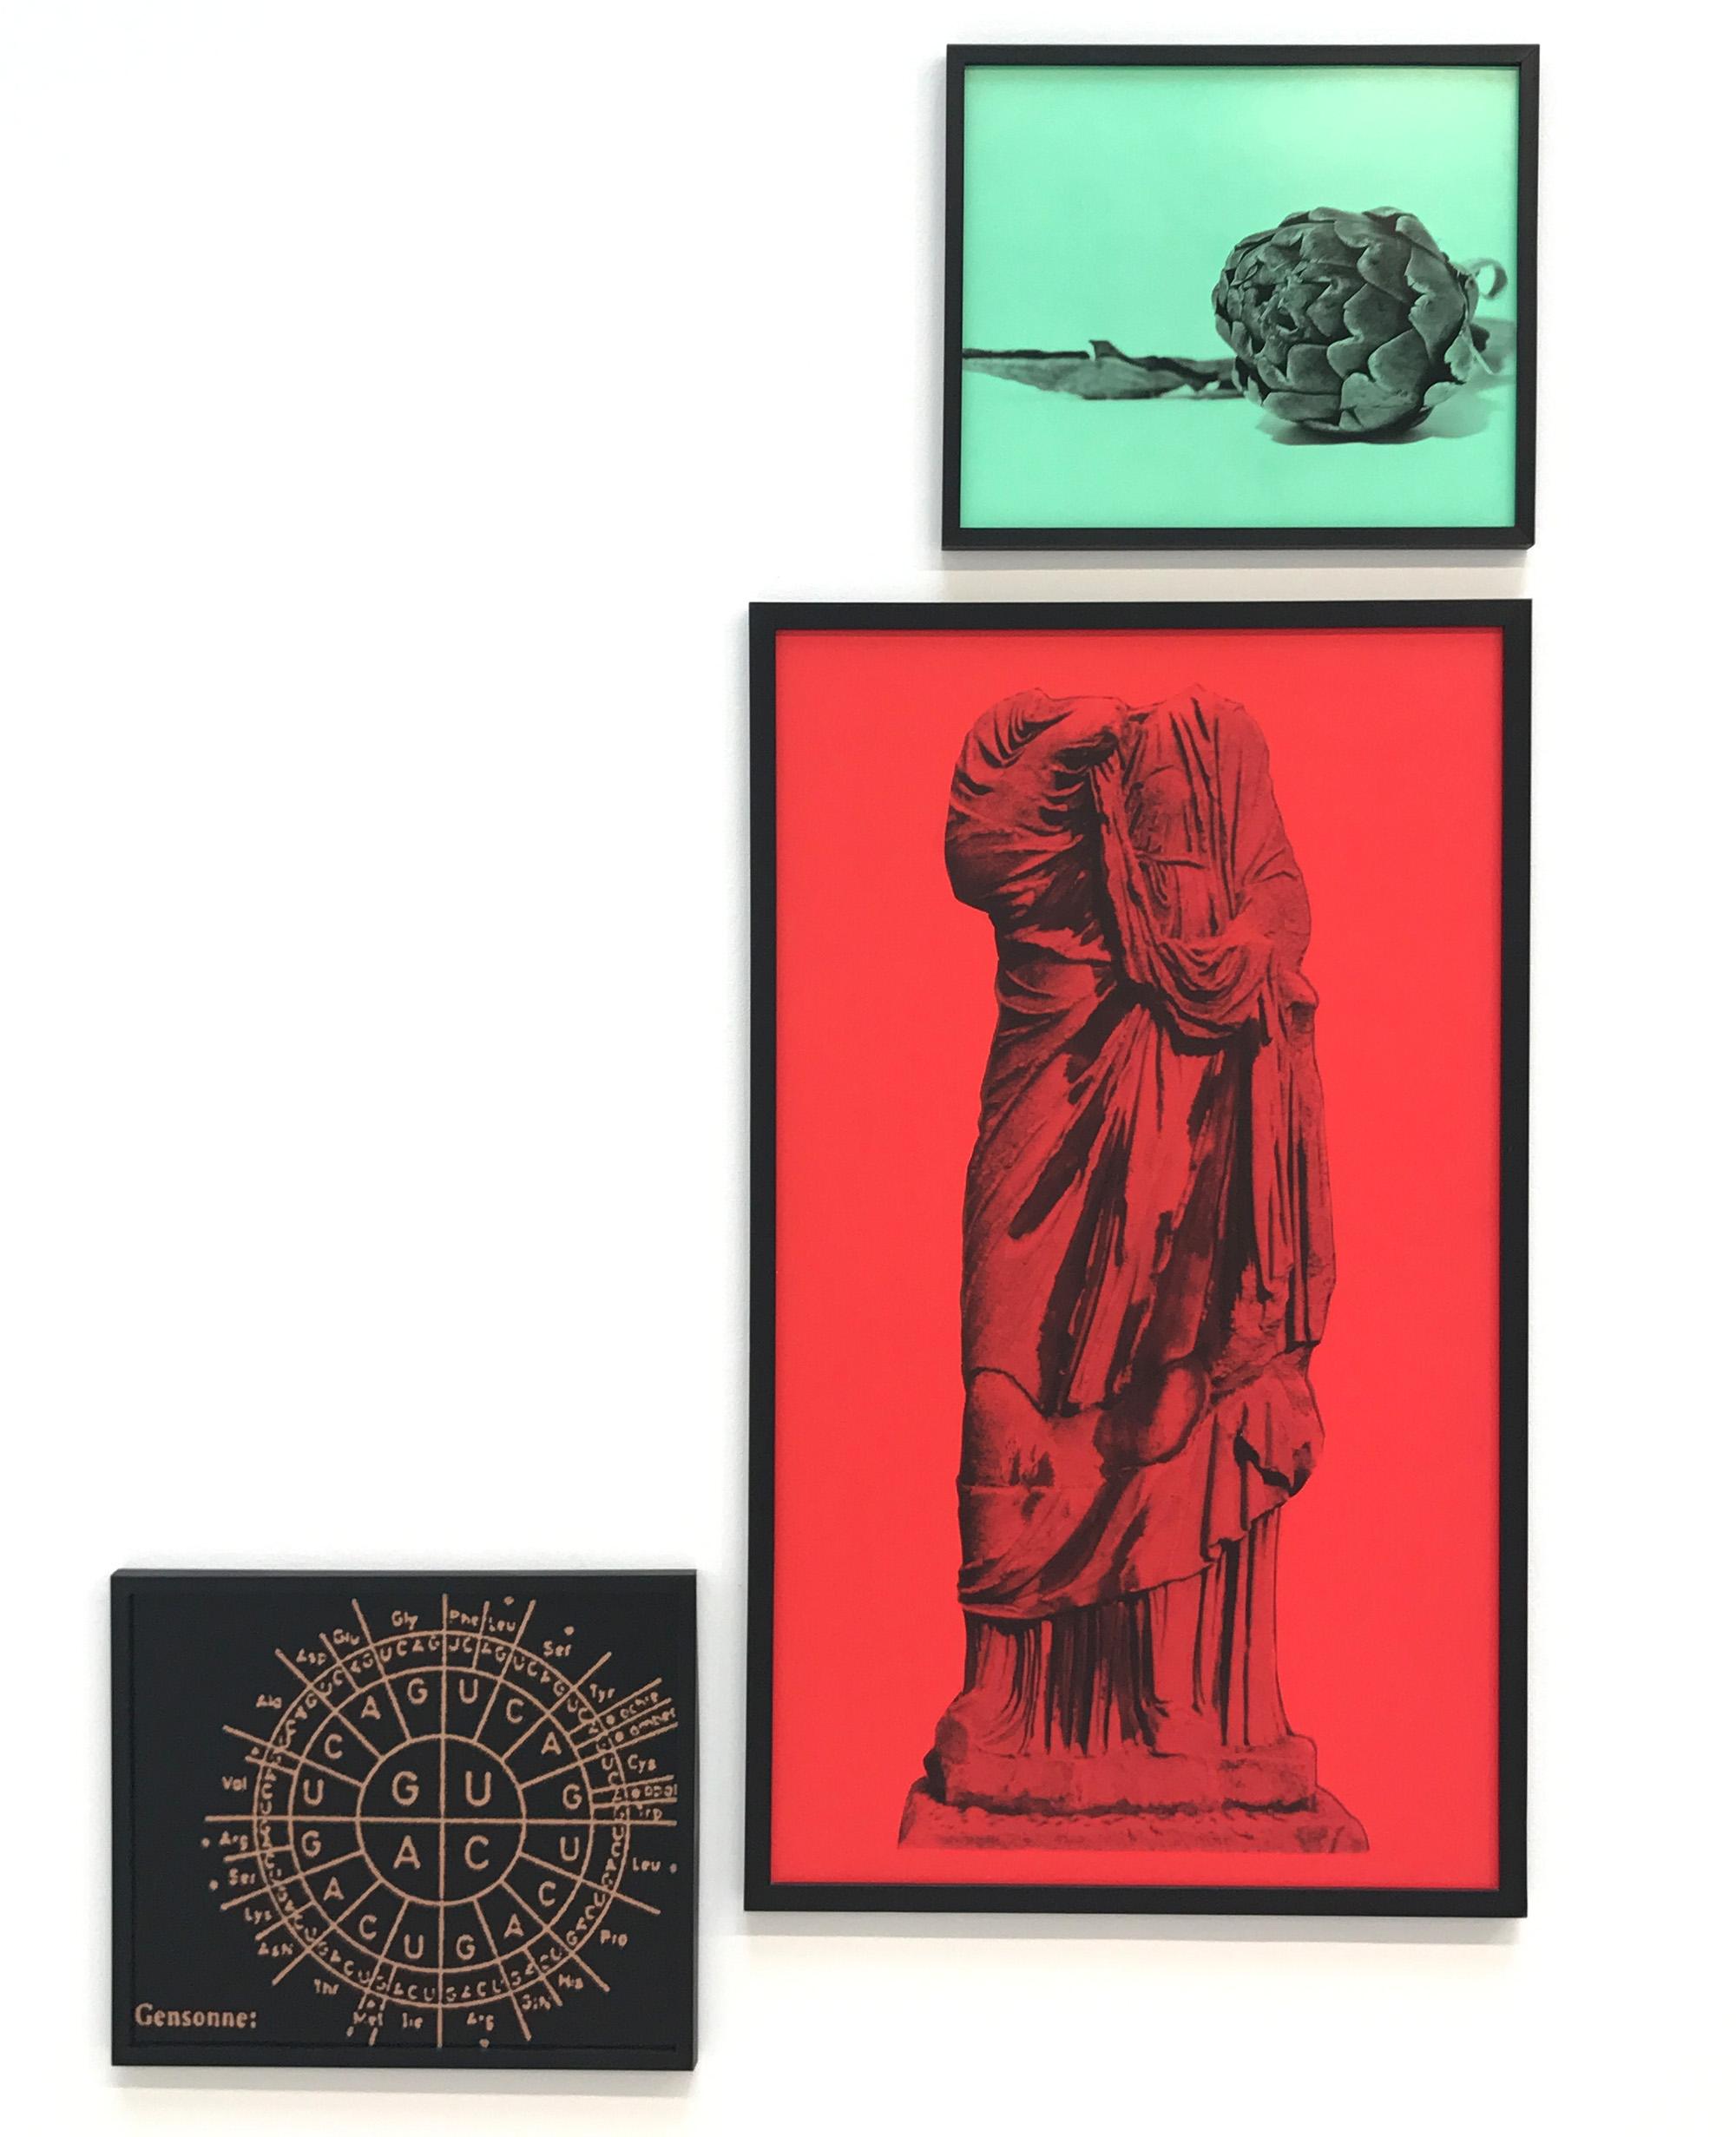 photographic paper, manual, hand made, digital, concptual art